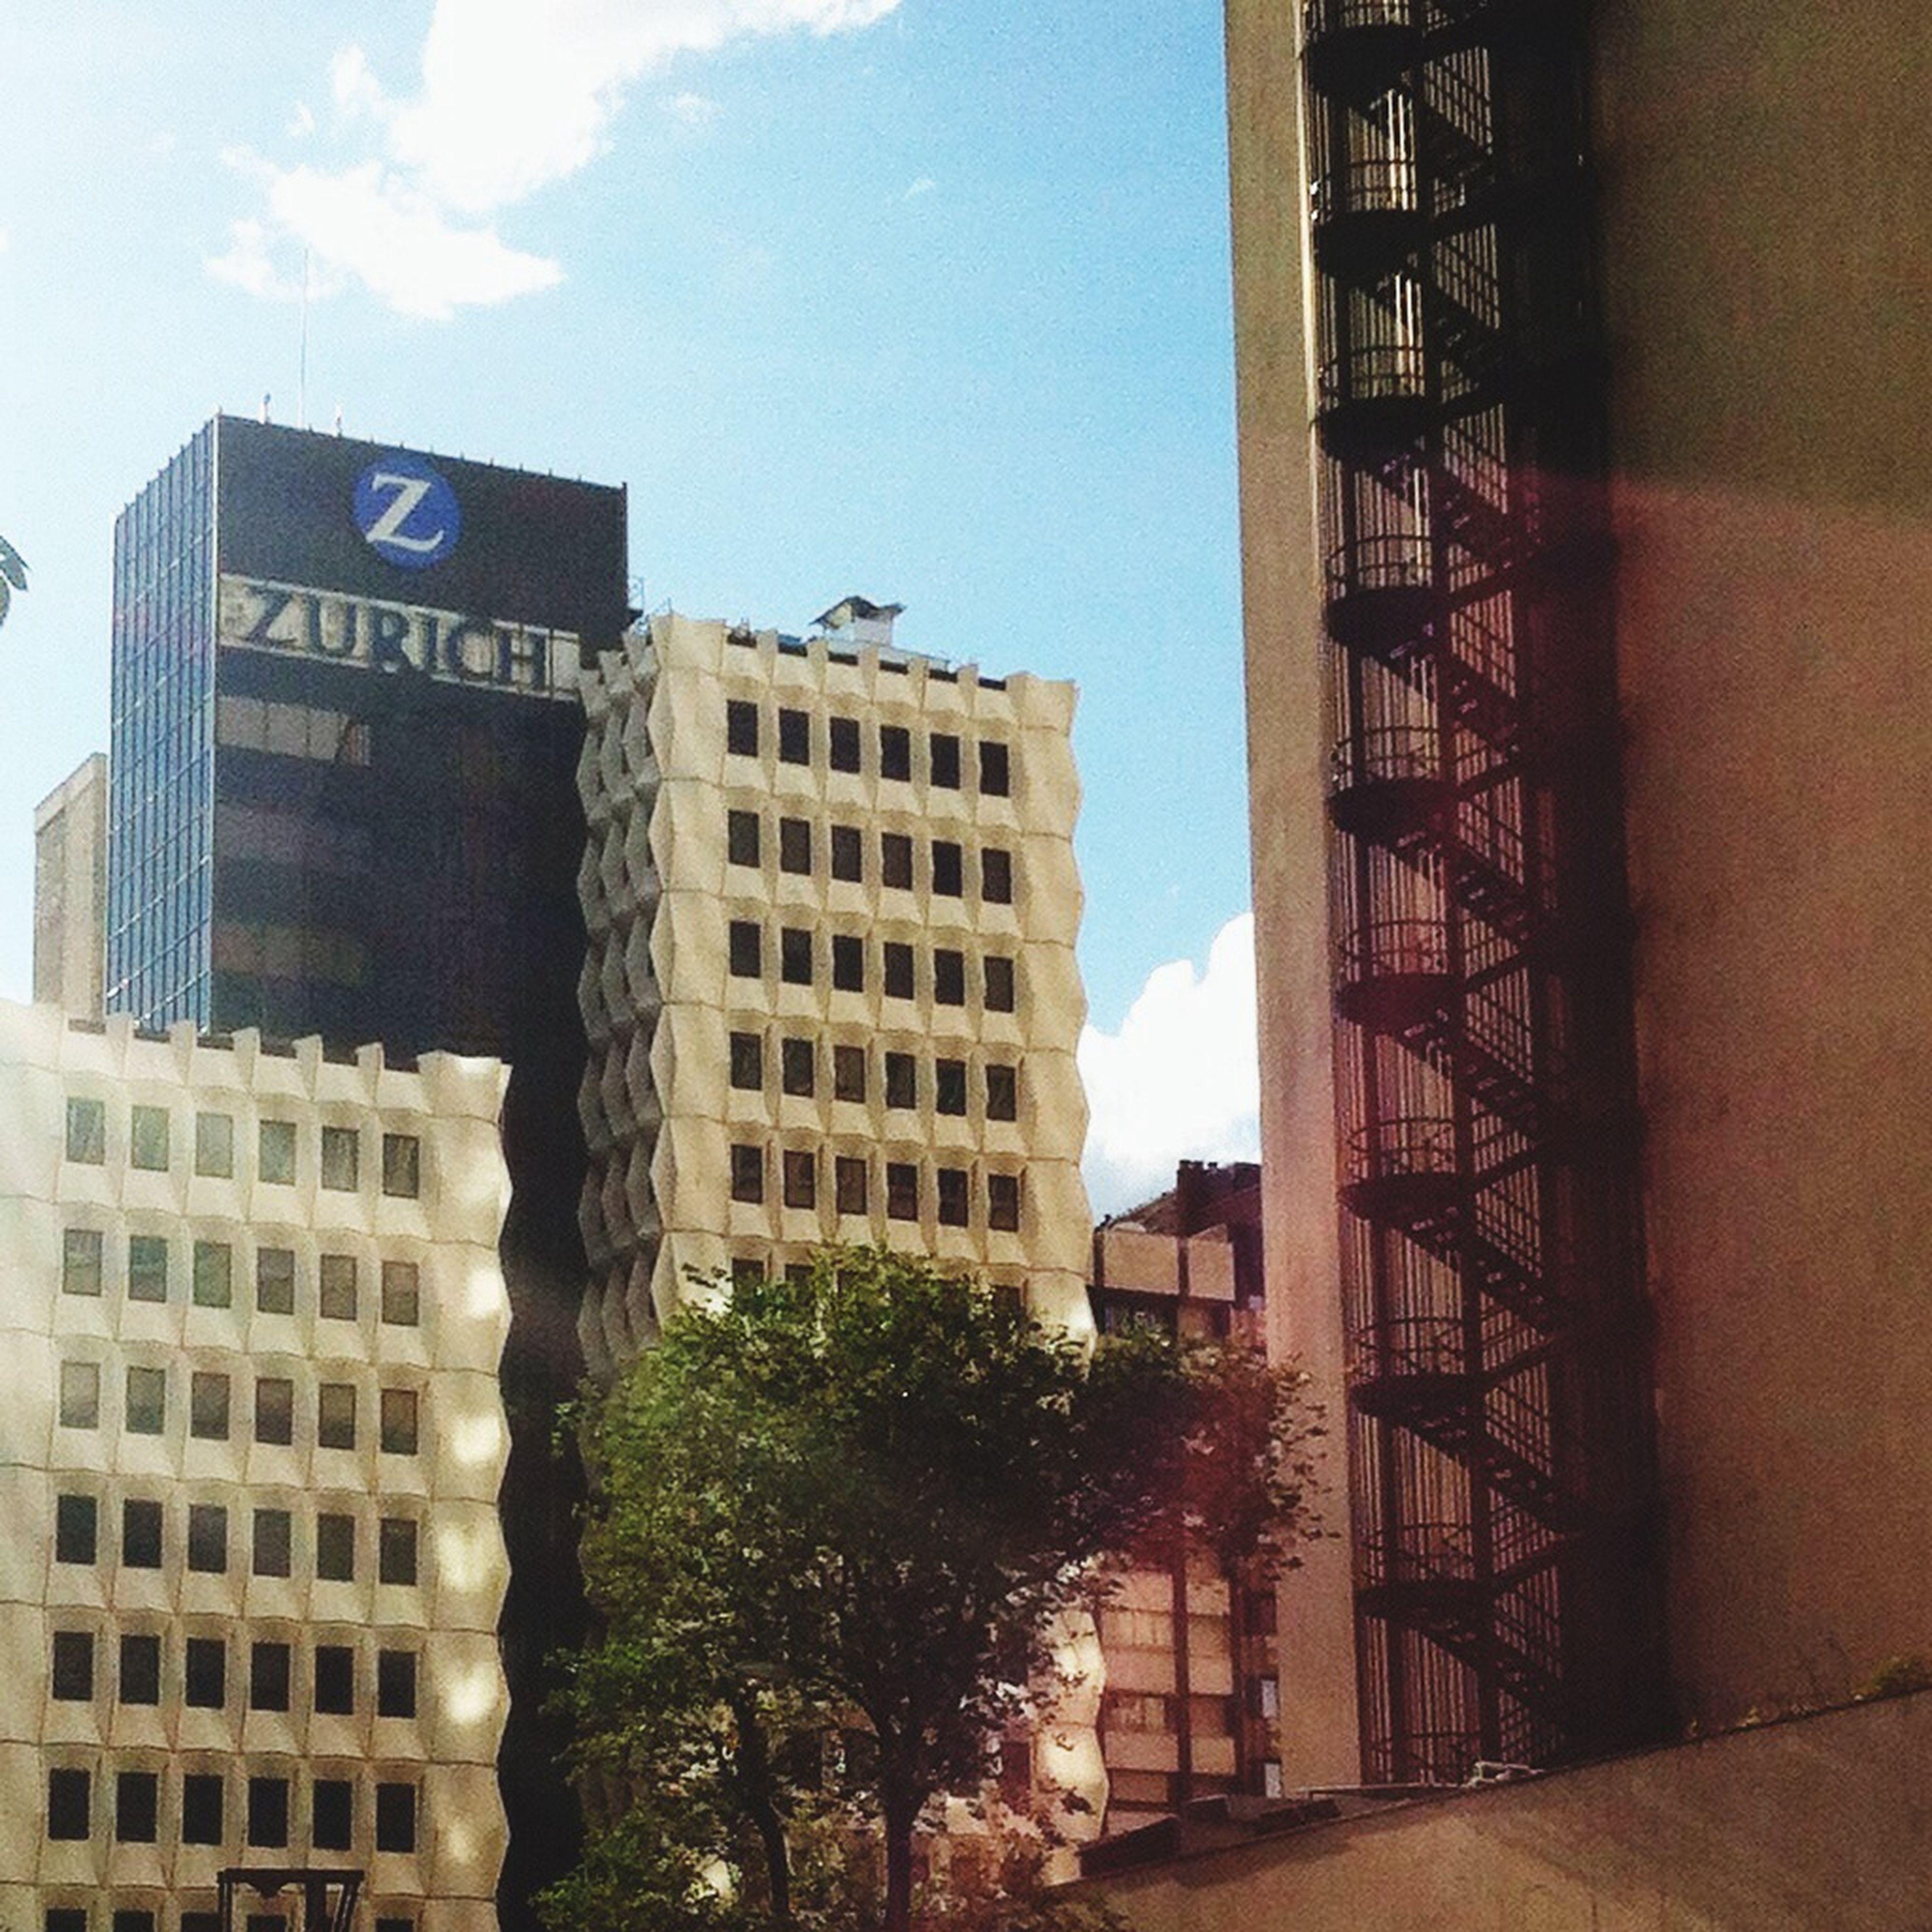 Cityscapes Spain♥ SPAIN Madrid Eyeemmadrid Madrid Spain Edificio Zurich Capitán Haya